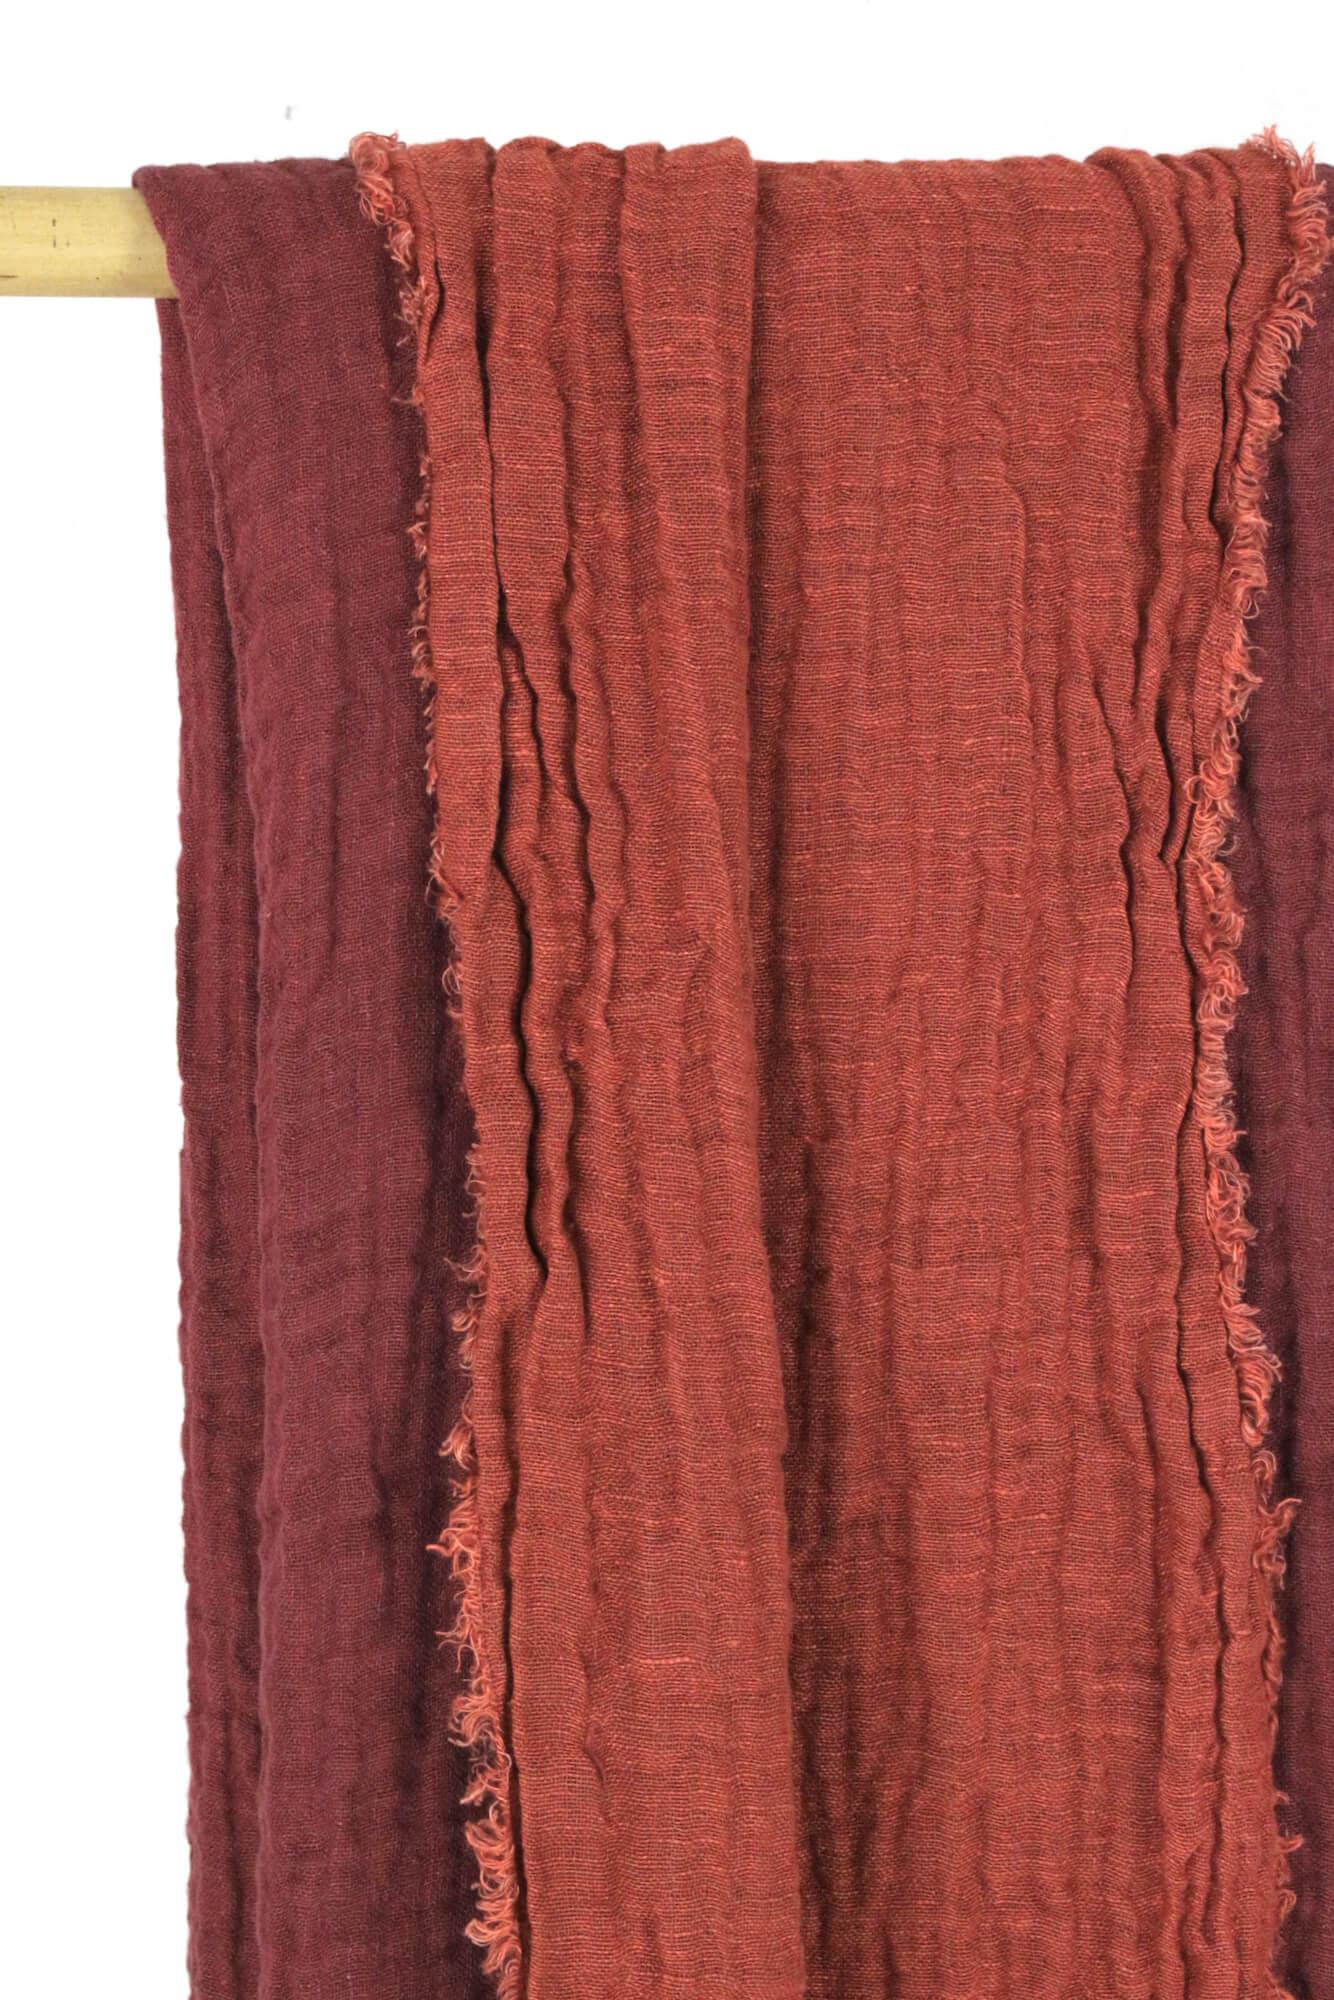 Rote Leinendecke zweifarbig